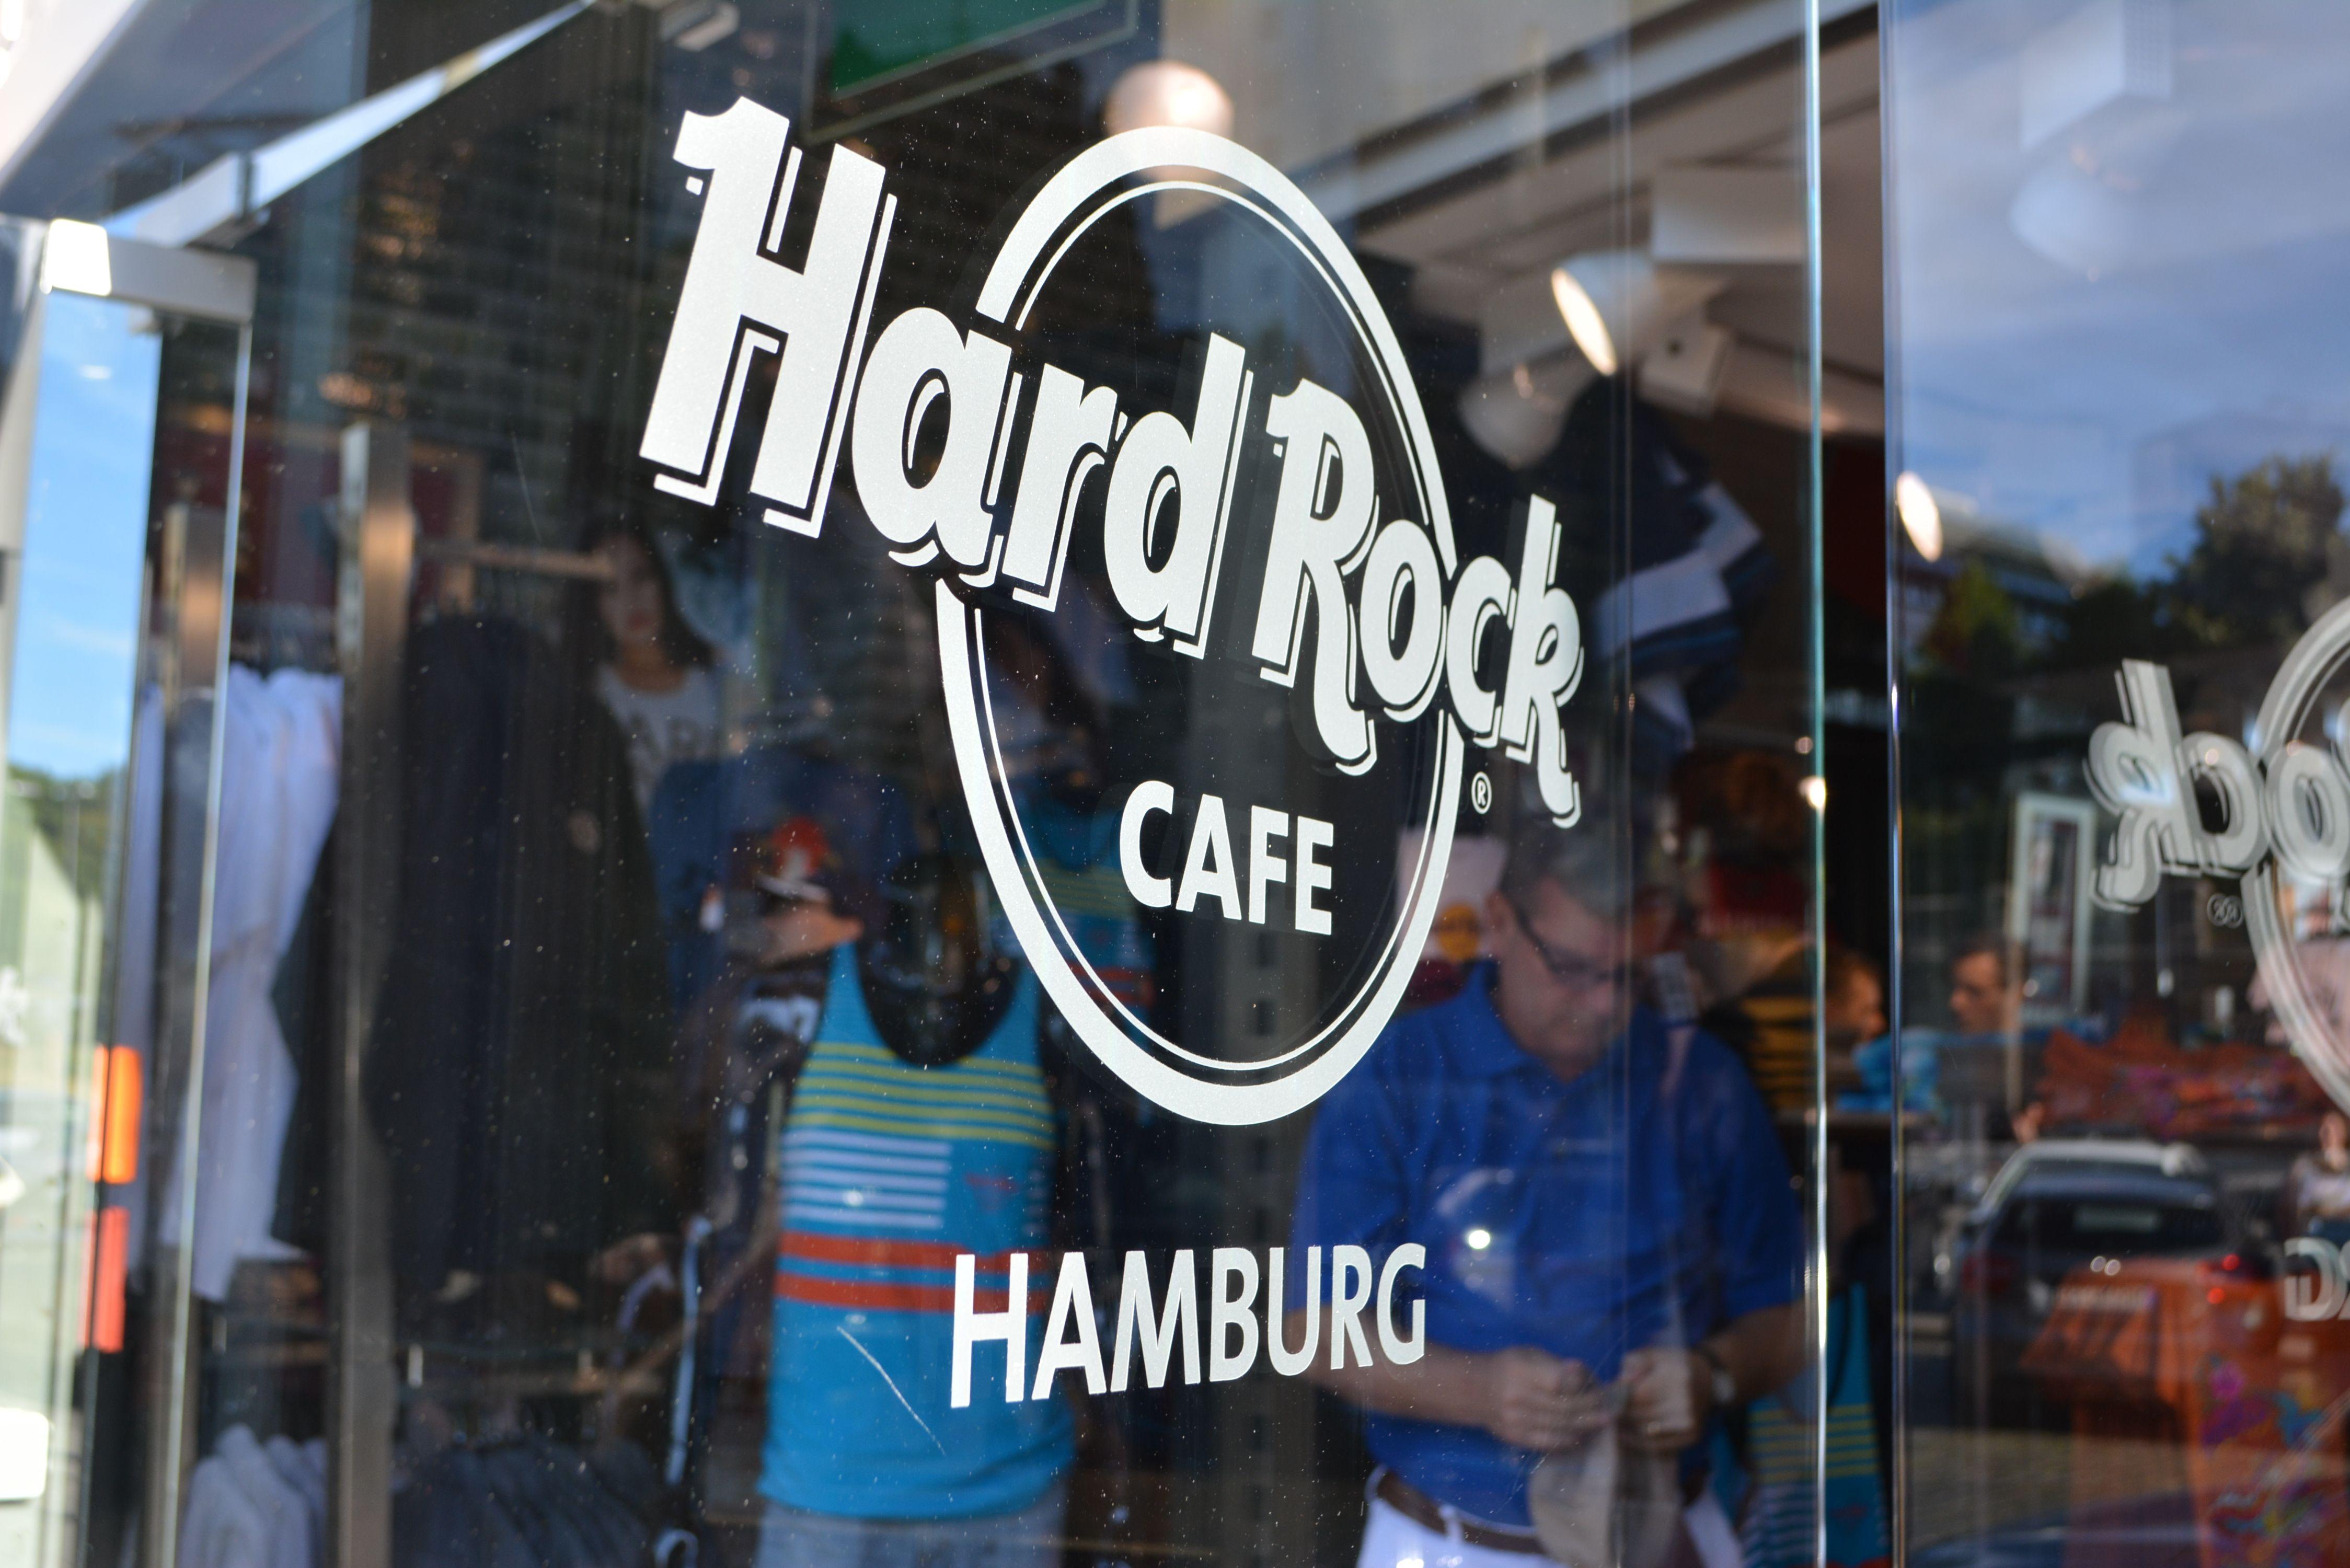 Hard Rock Cafe Hamburg Germany Cafe Hamburg Das Wunder Von Bern Hamburg